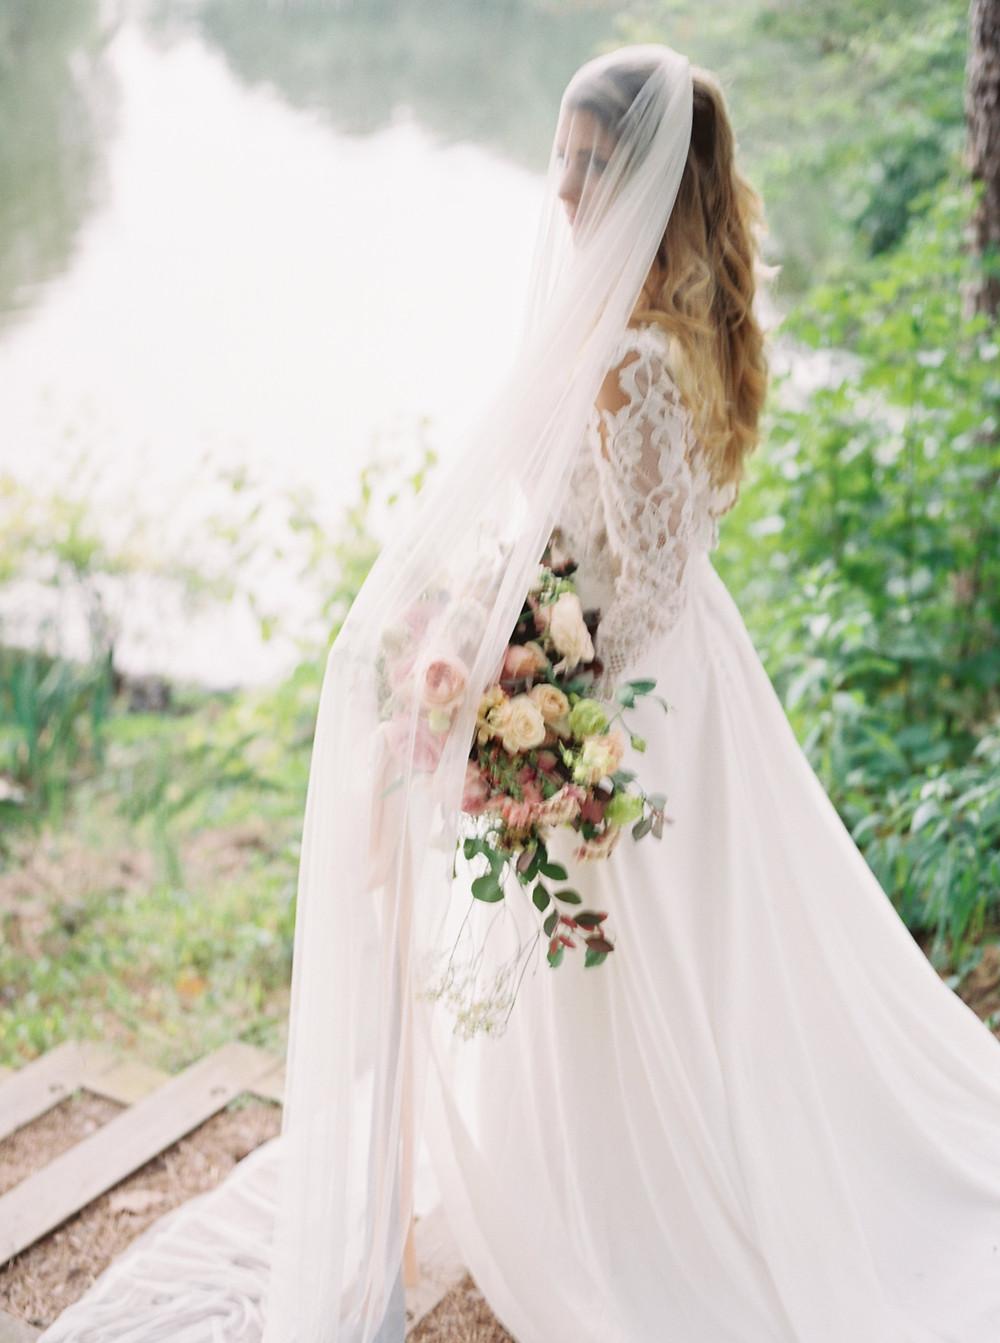 Birmingham al bride, bouquet planner